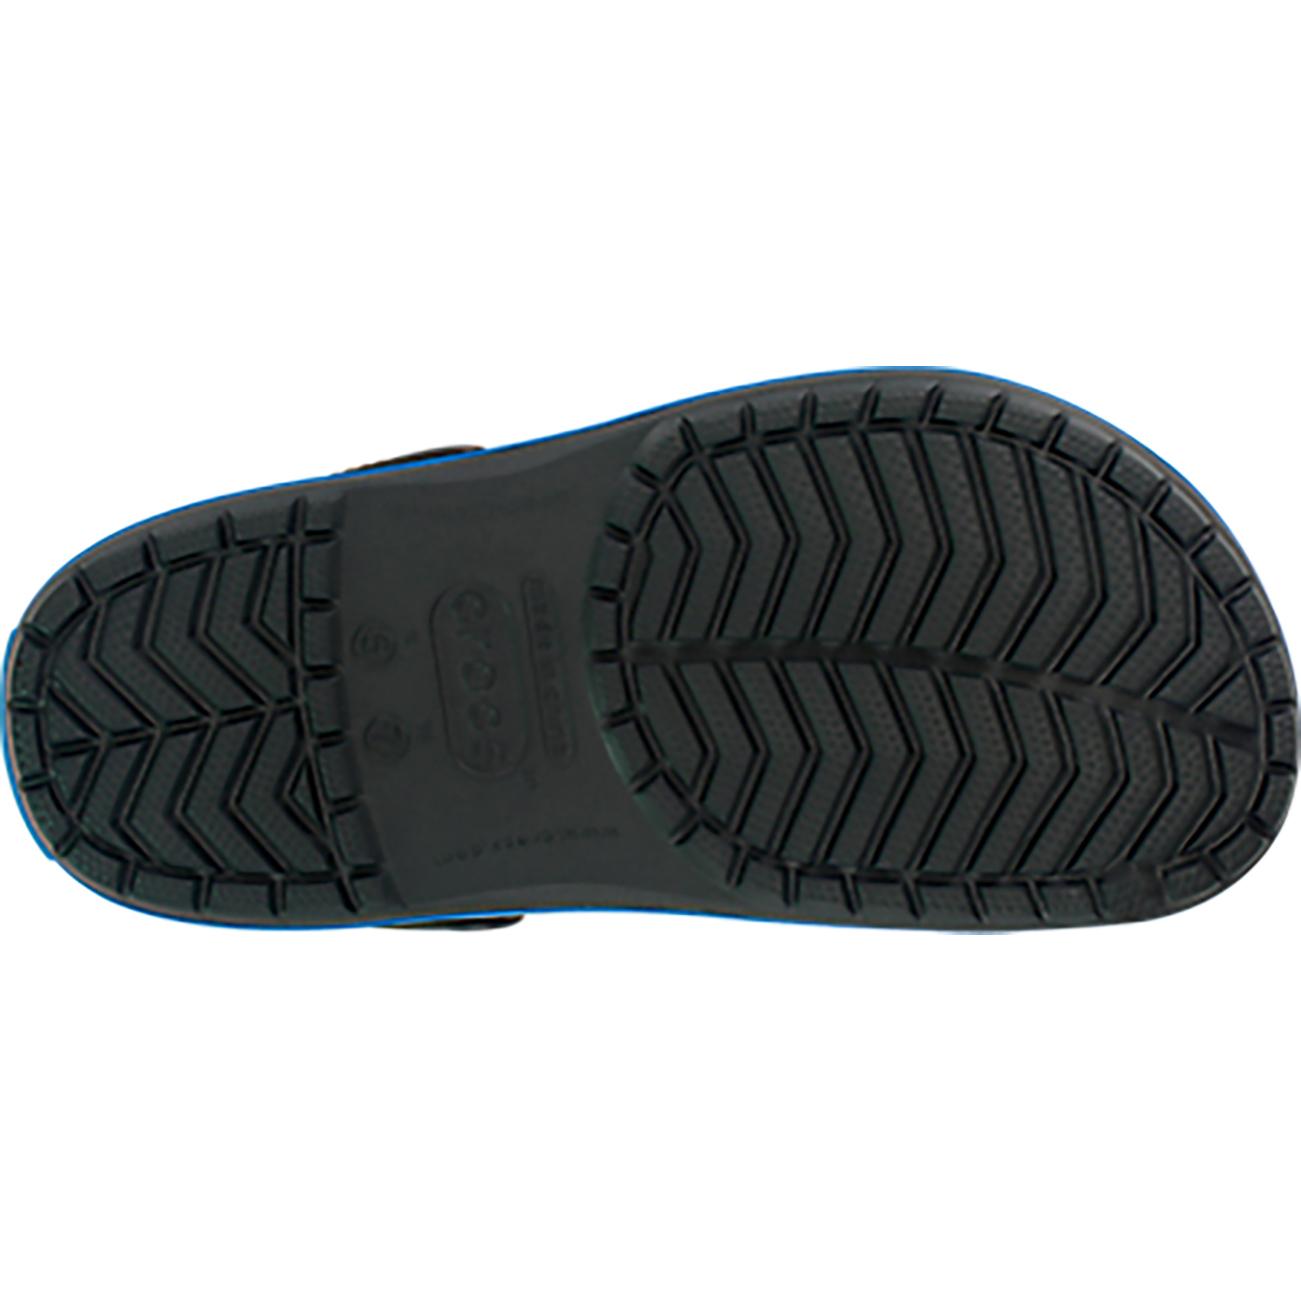 Unisex-Adults-Crocs-Crocband-Clog-Comfort-Lightweight-Water-Pool-Shoes-UK-3-16 thumbnail 7